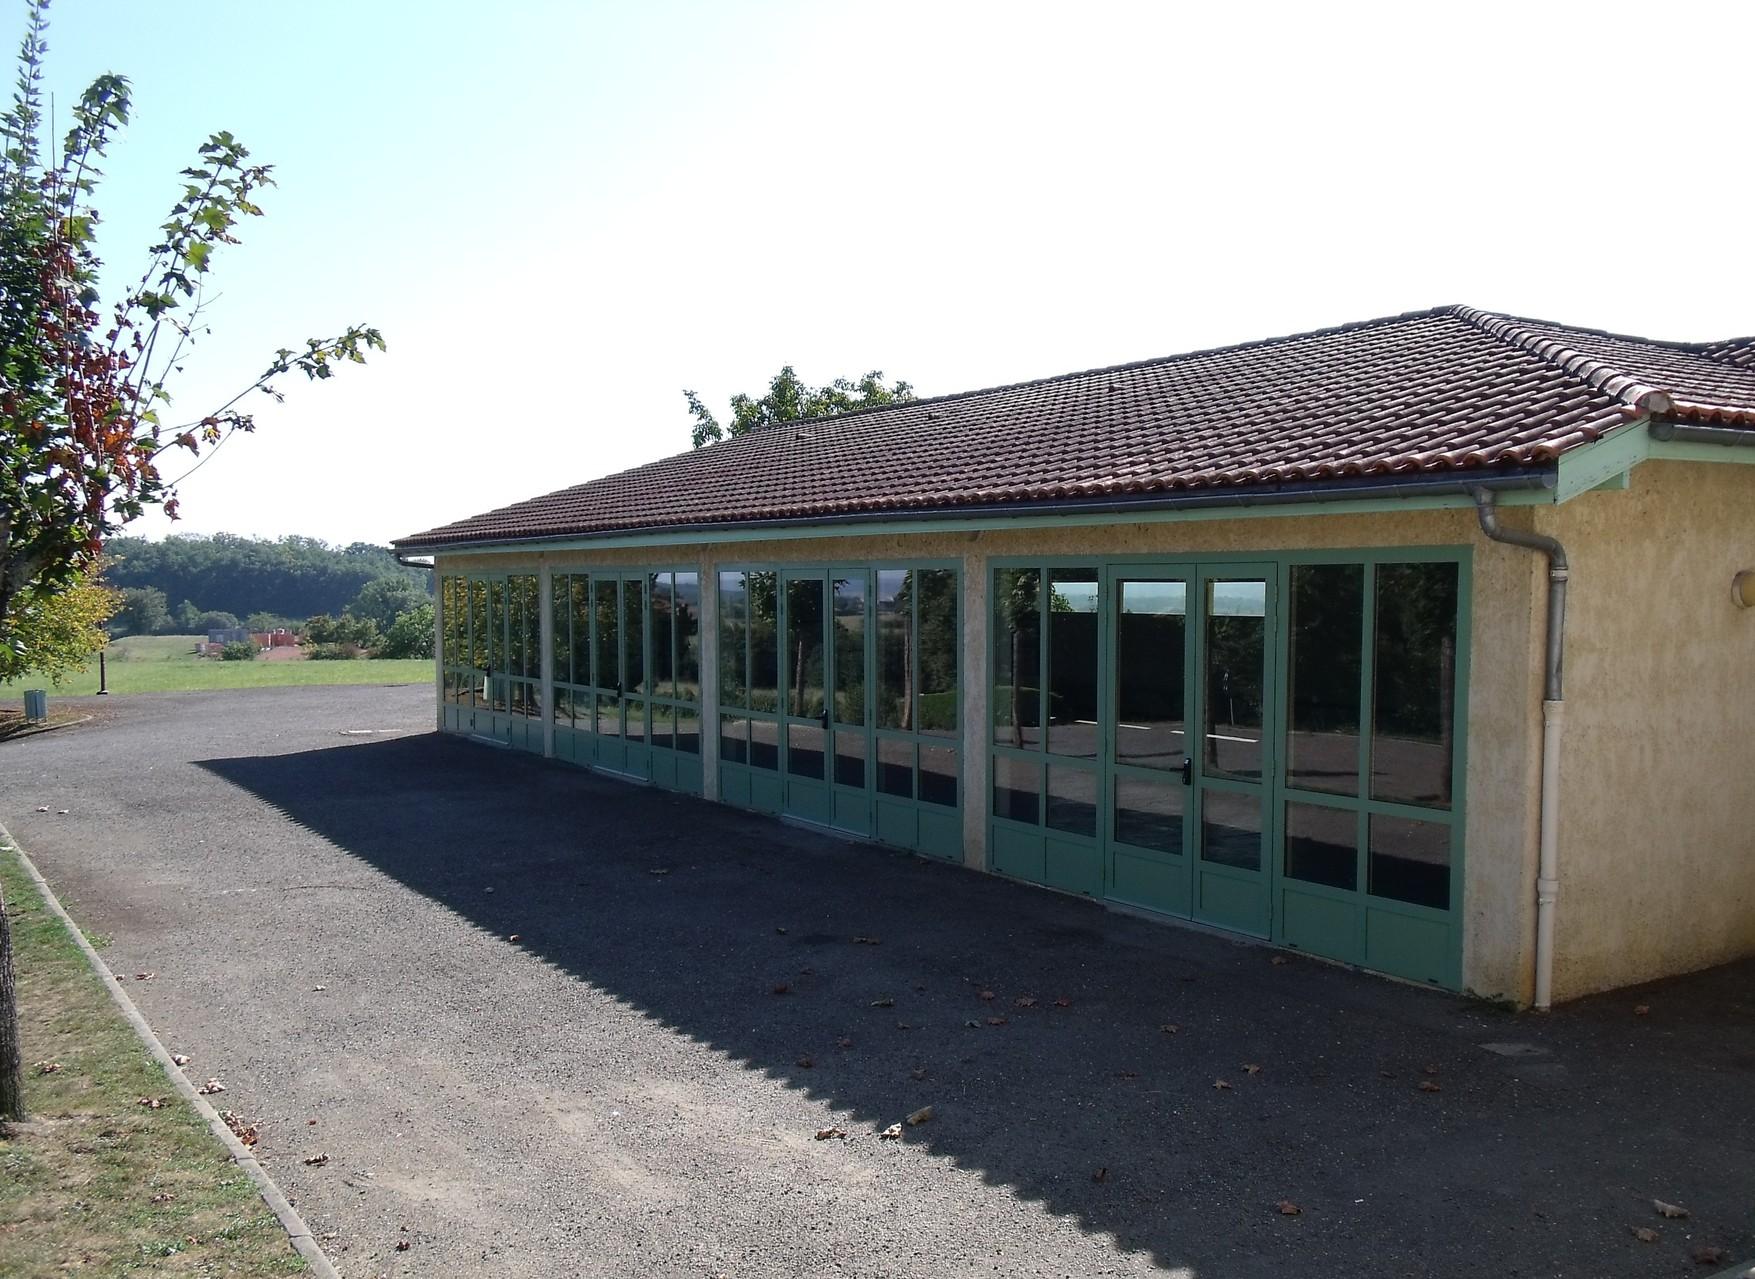 Salle des fêtes 1